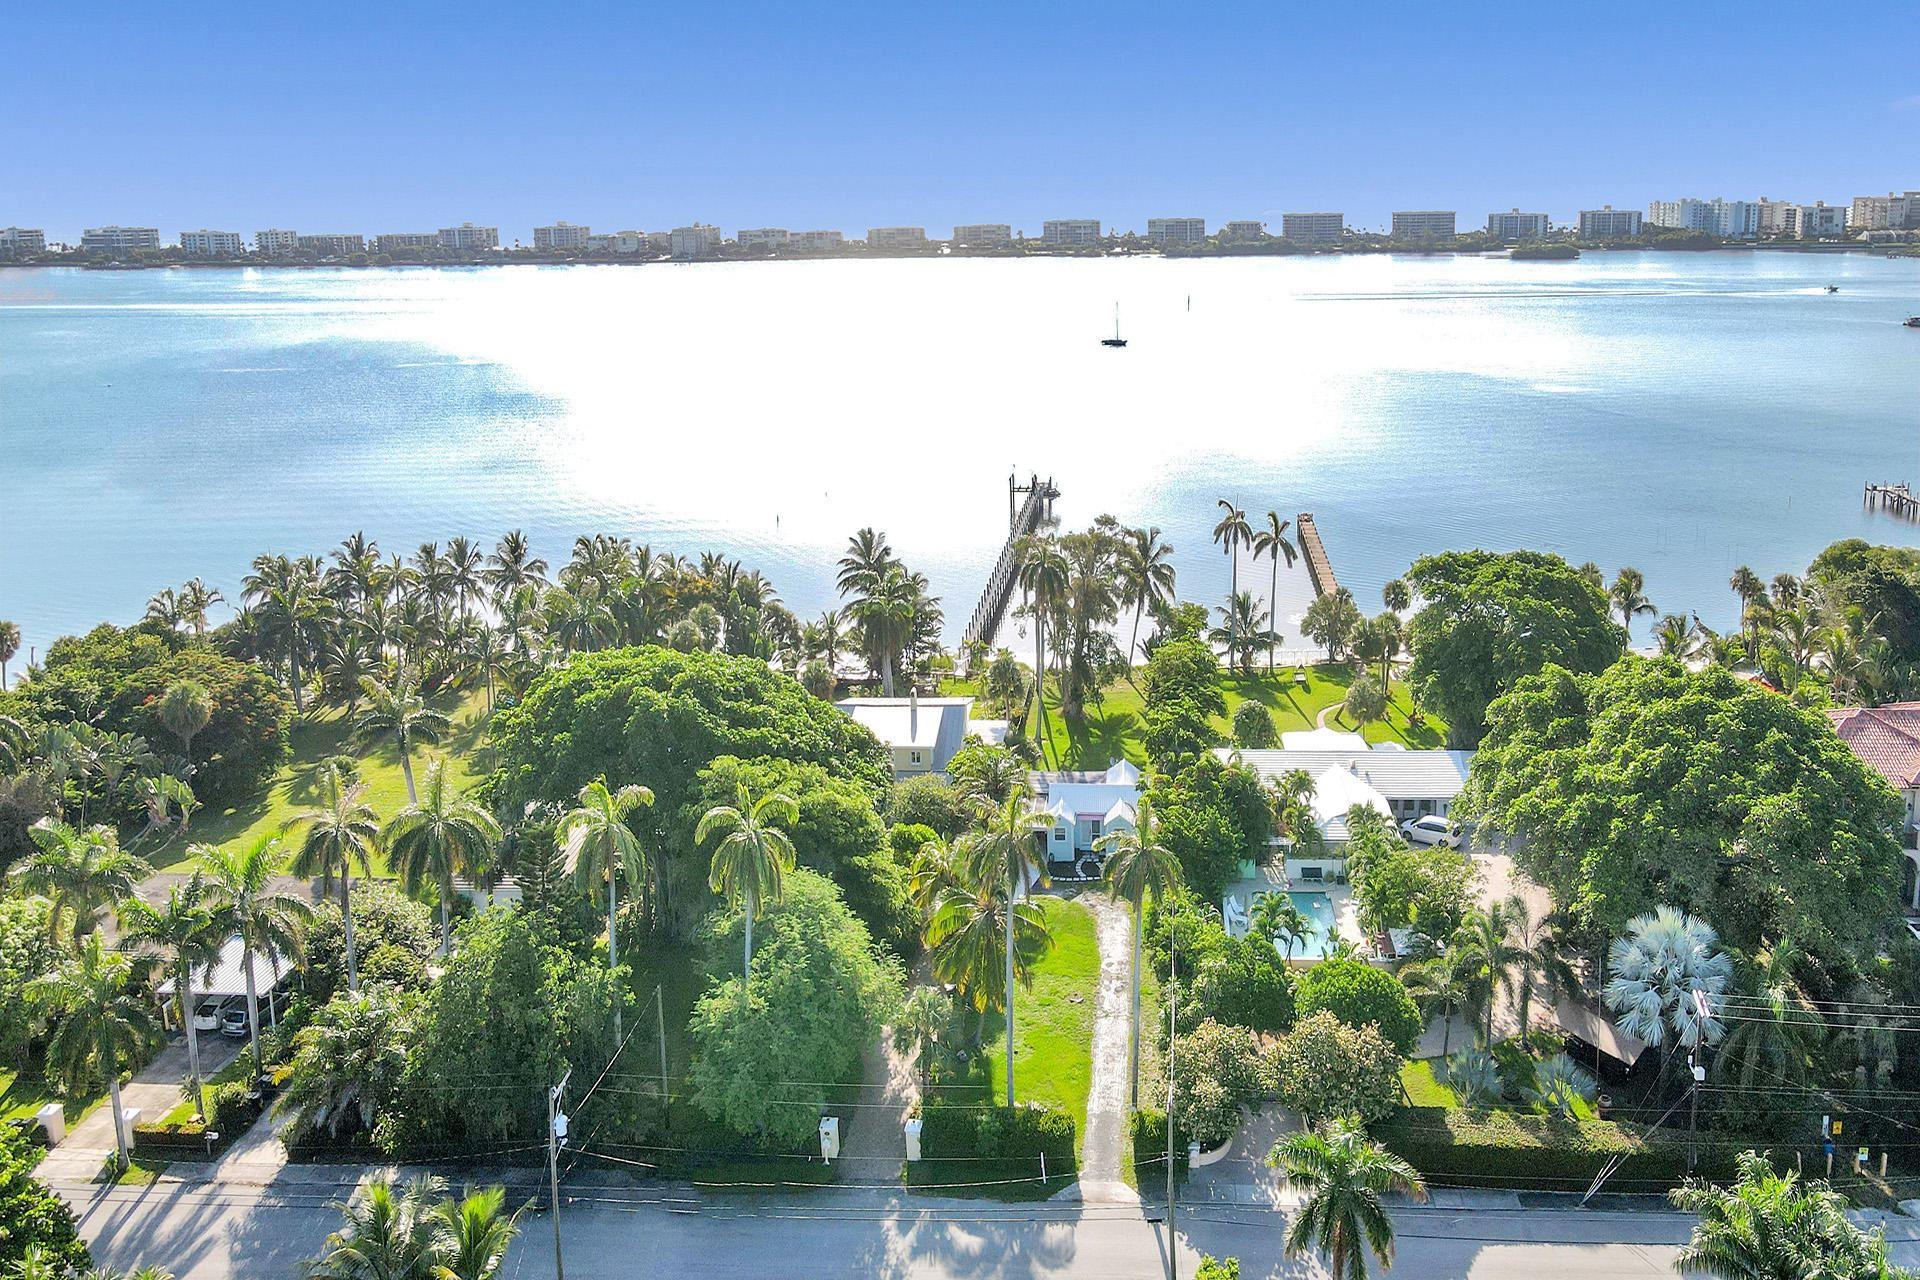 1224 S Lakeside Dr Drive, Lake Worth, FL 33460 - MLS#: RX-10735529